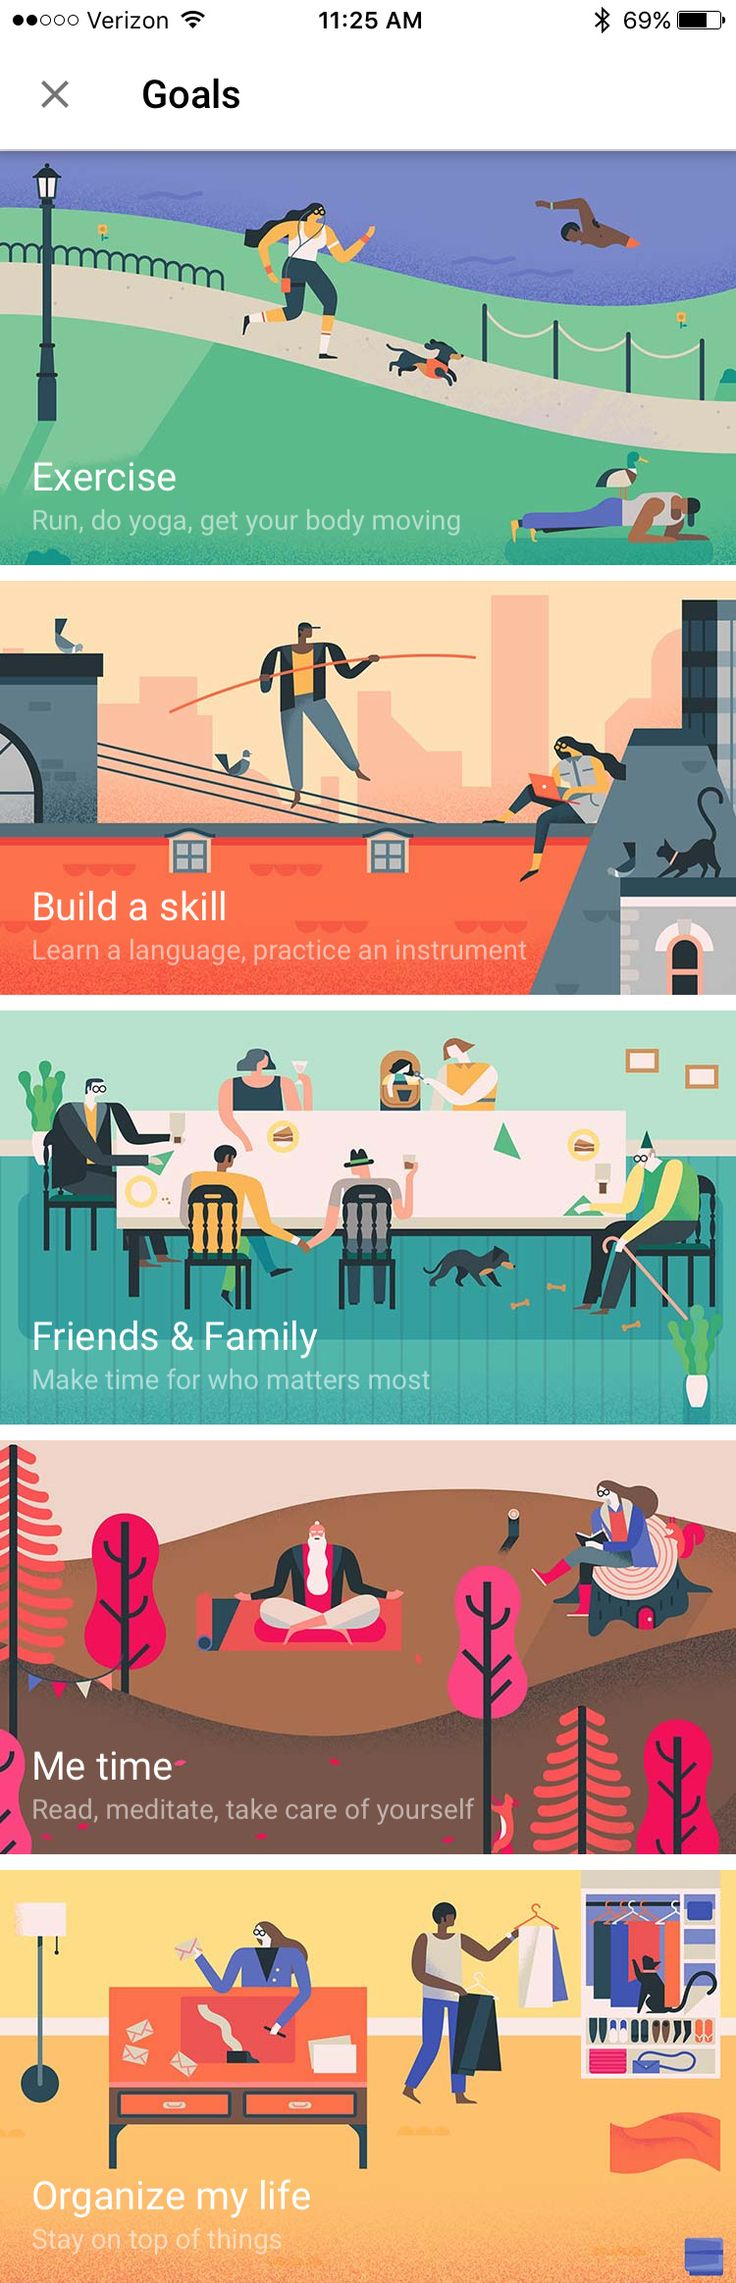 Google Calendar Goals Illustrations — Owen Davey